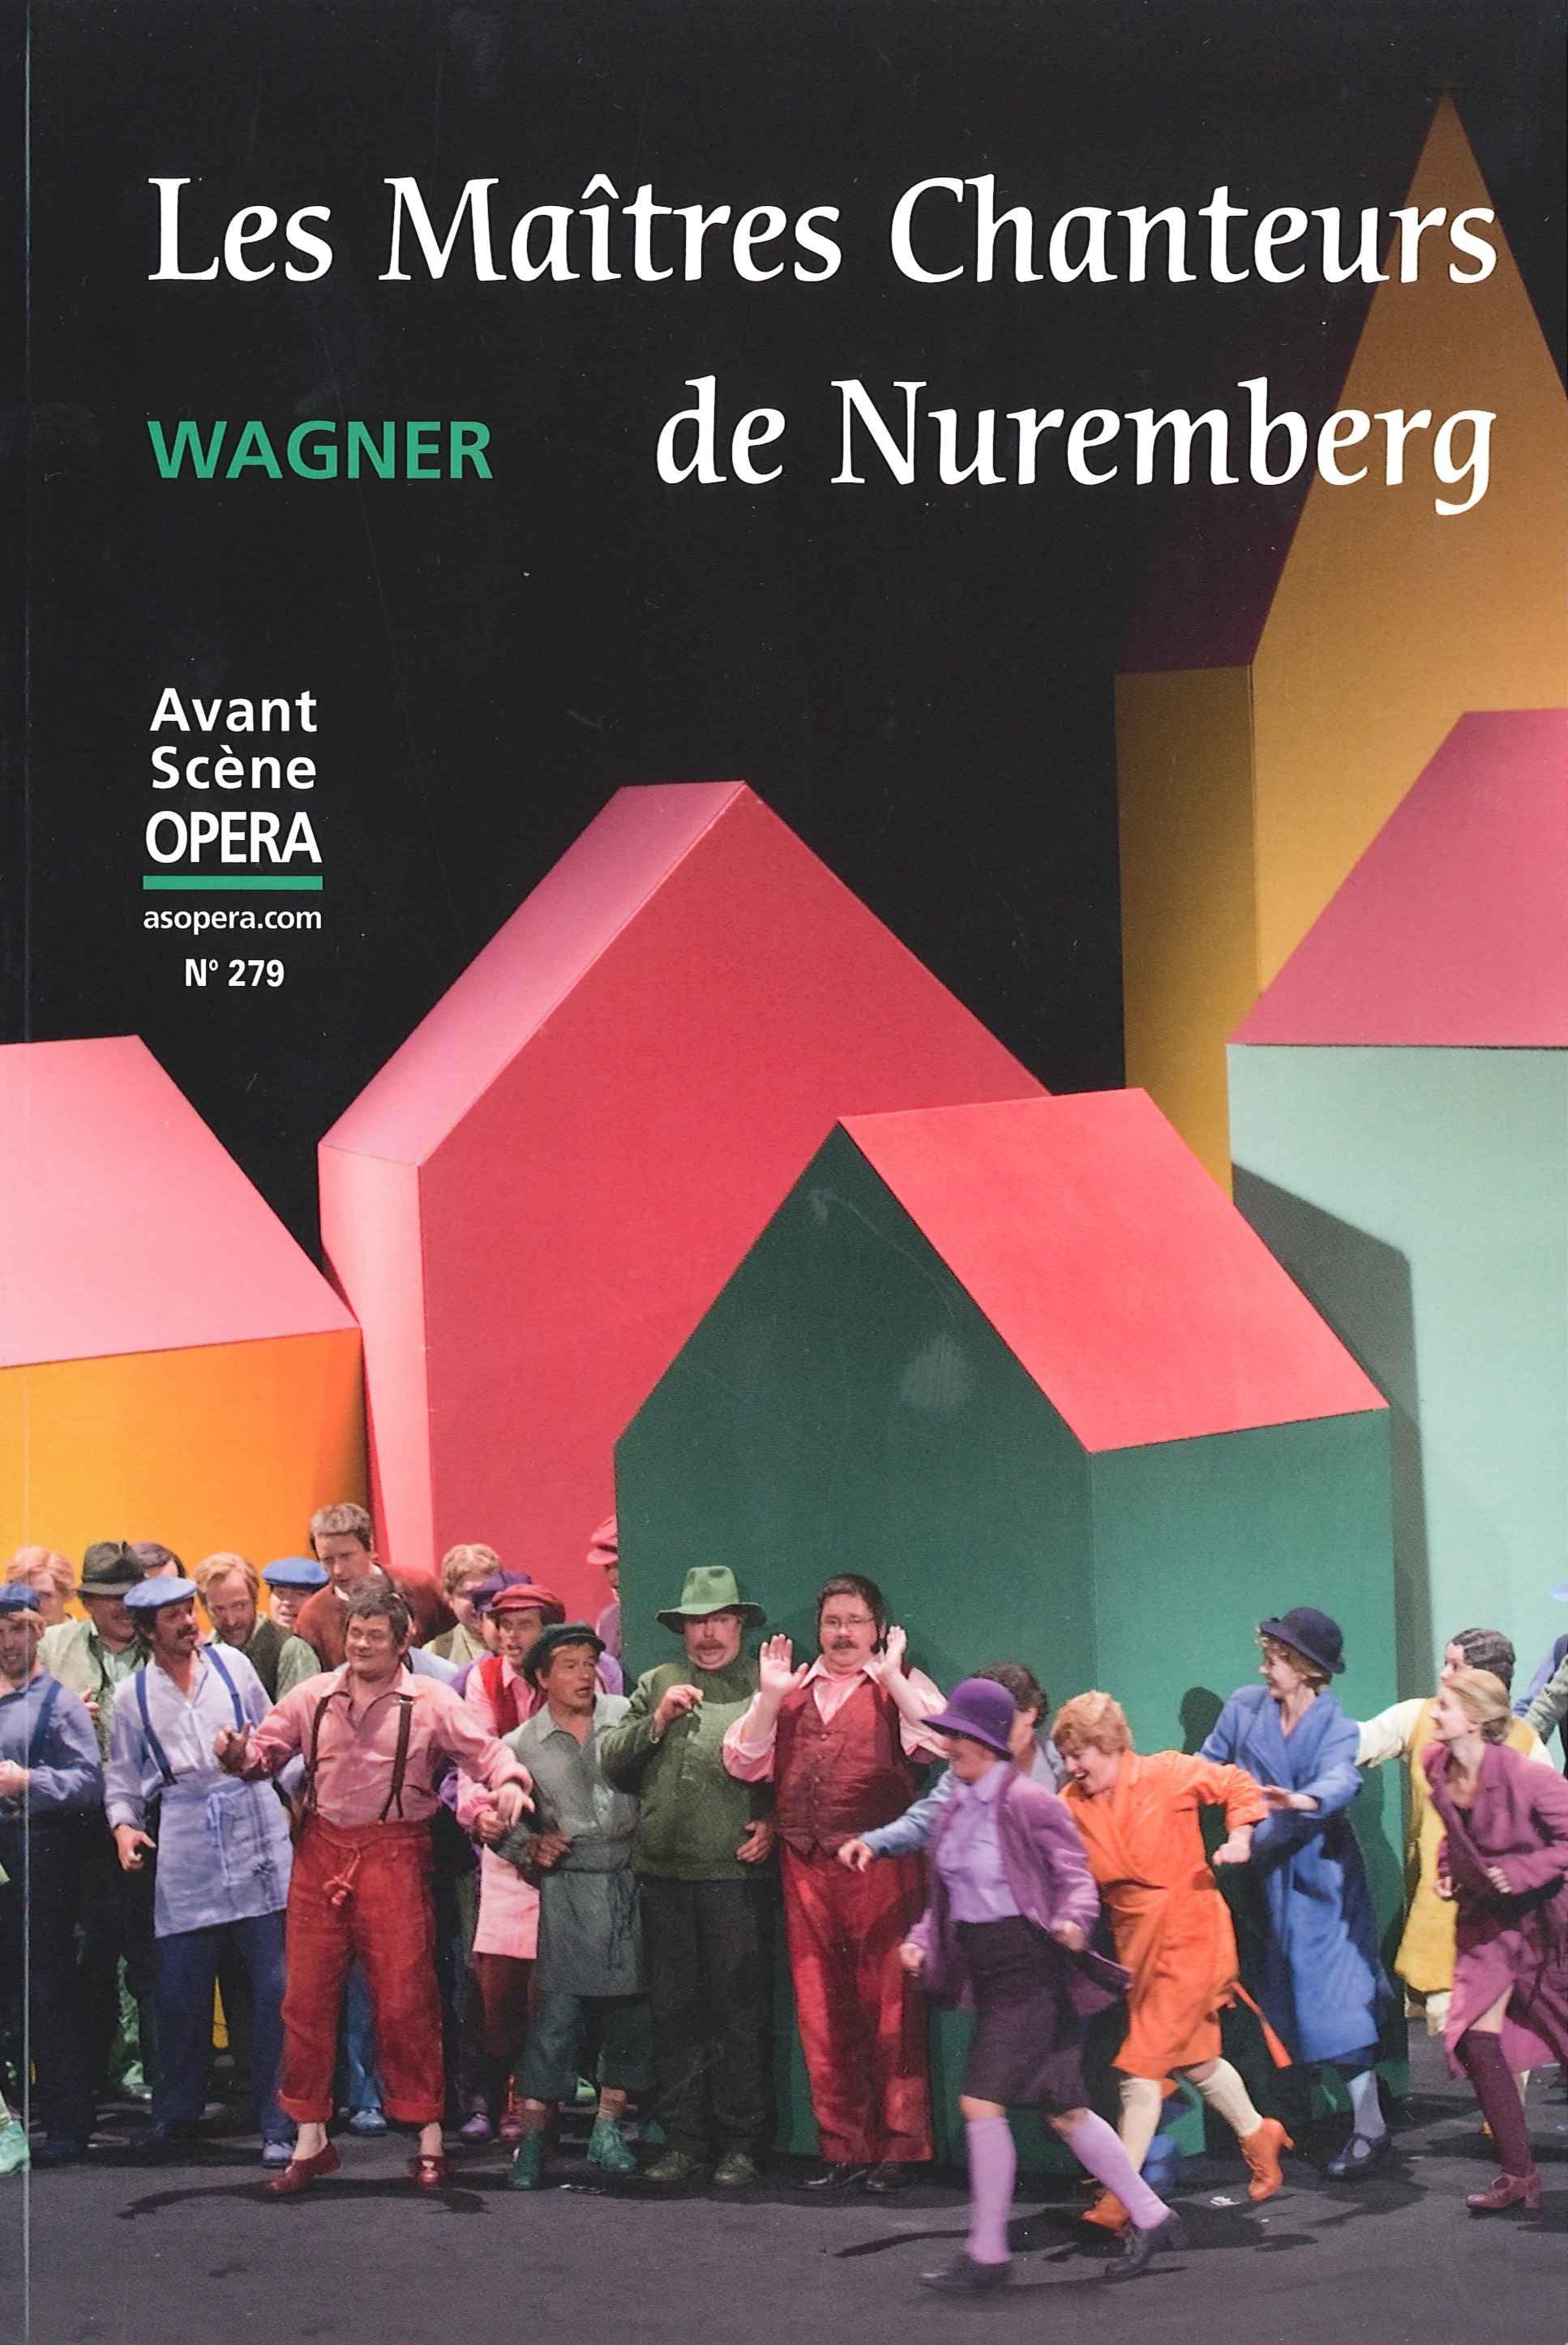 Les maîtres chanteurs de Nuremberg